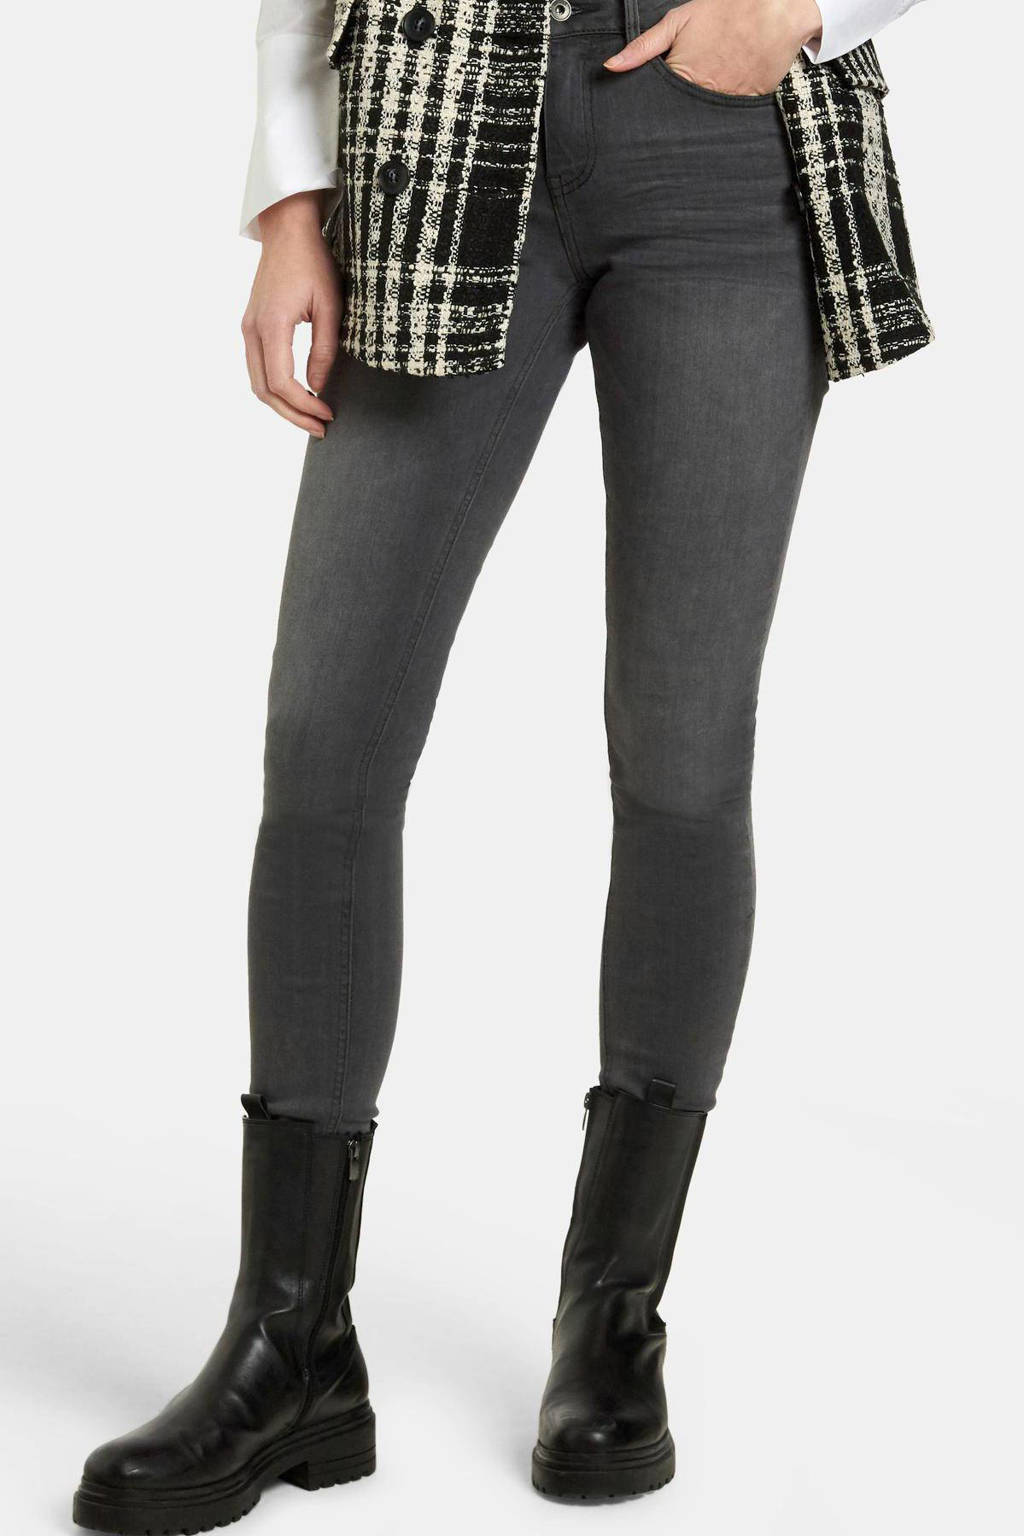 Eksept by Shoeby high waist skinny jeans Liza Edith lengtemaat 32 grijs, Grijs